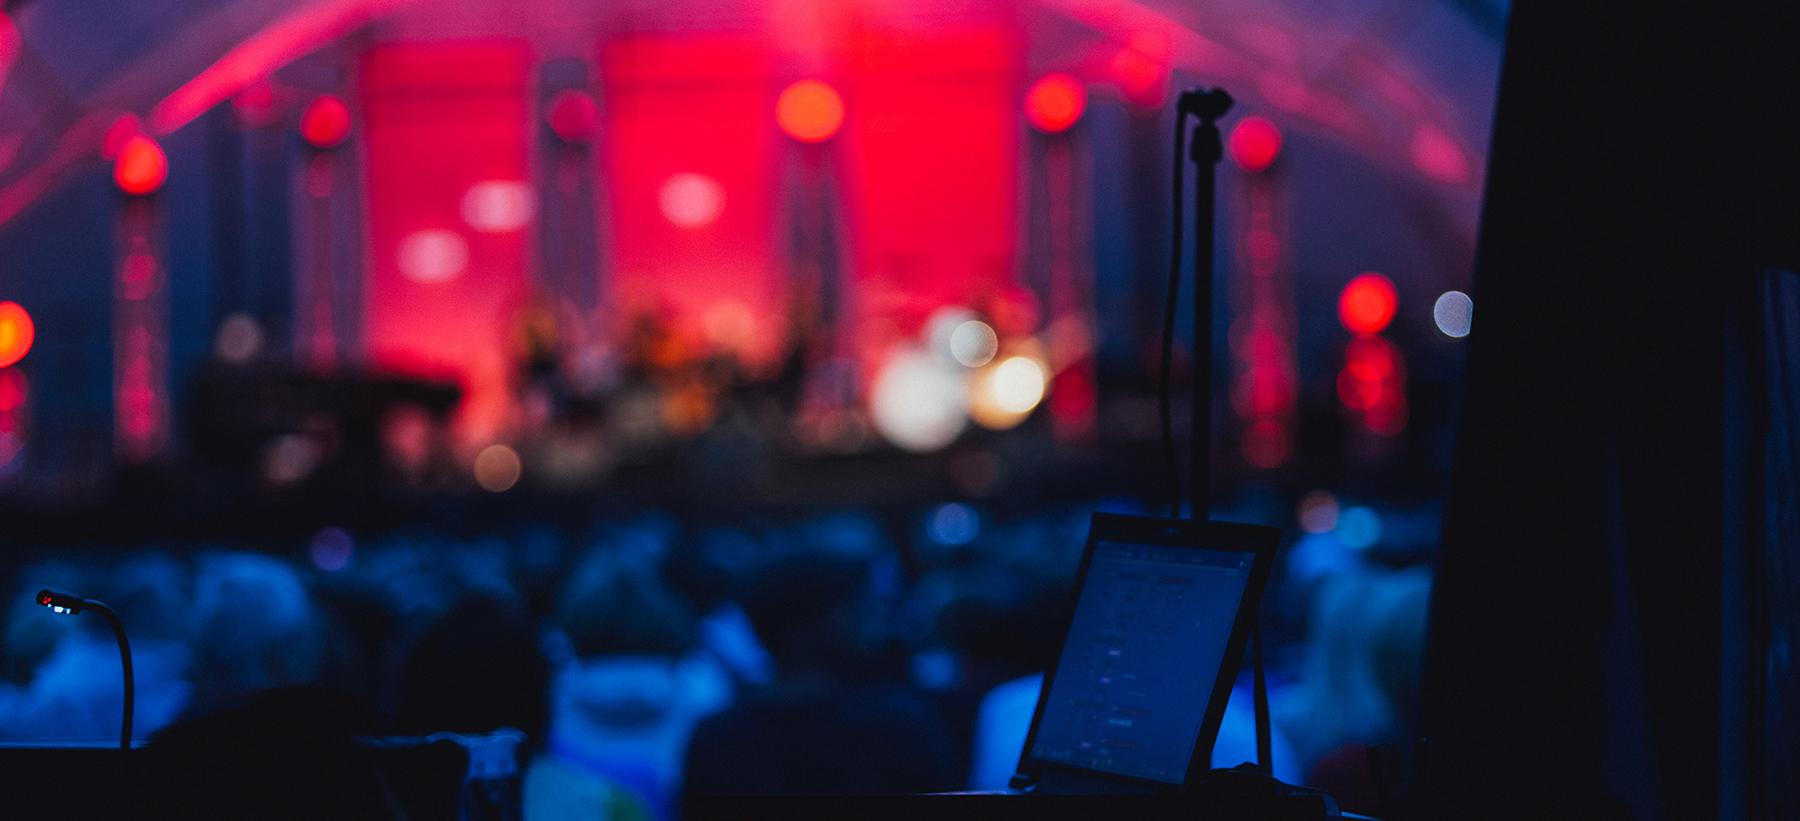 SXSW 2020 session tips